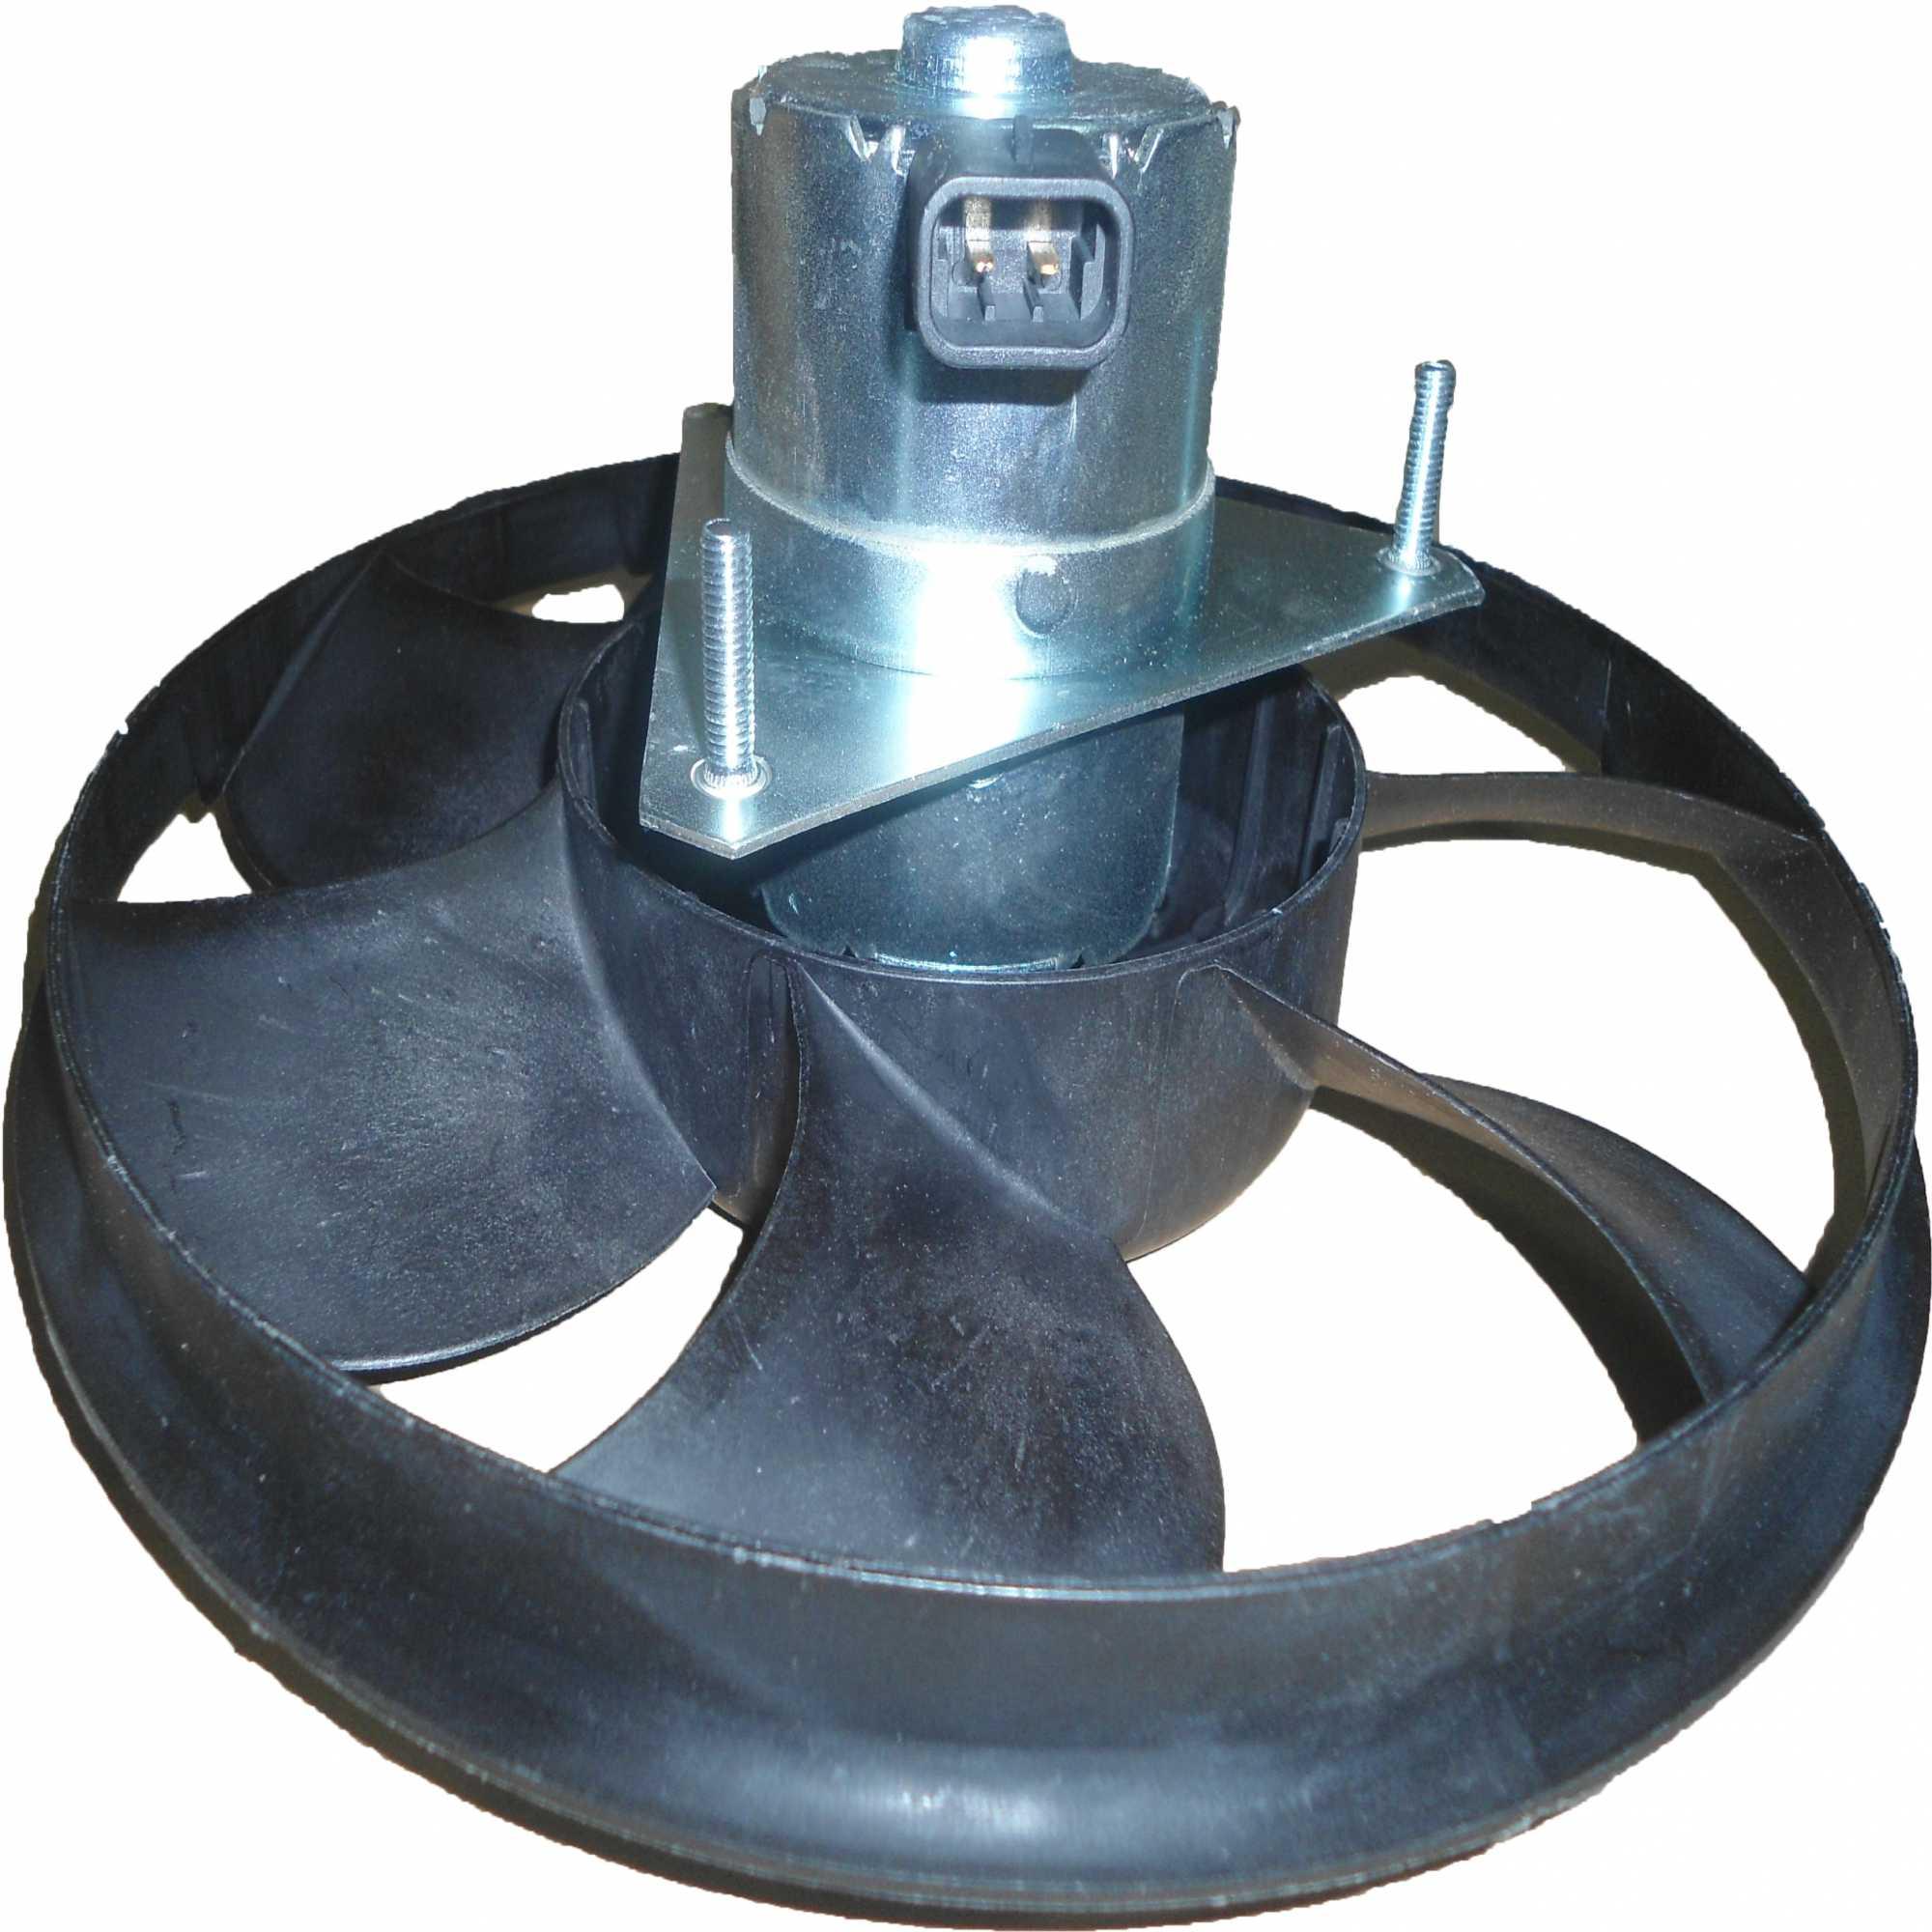 Embreagem Compressor - Compressor Sanden 7H15 Eixo